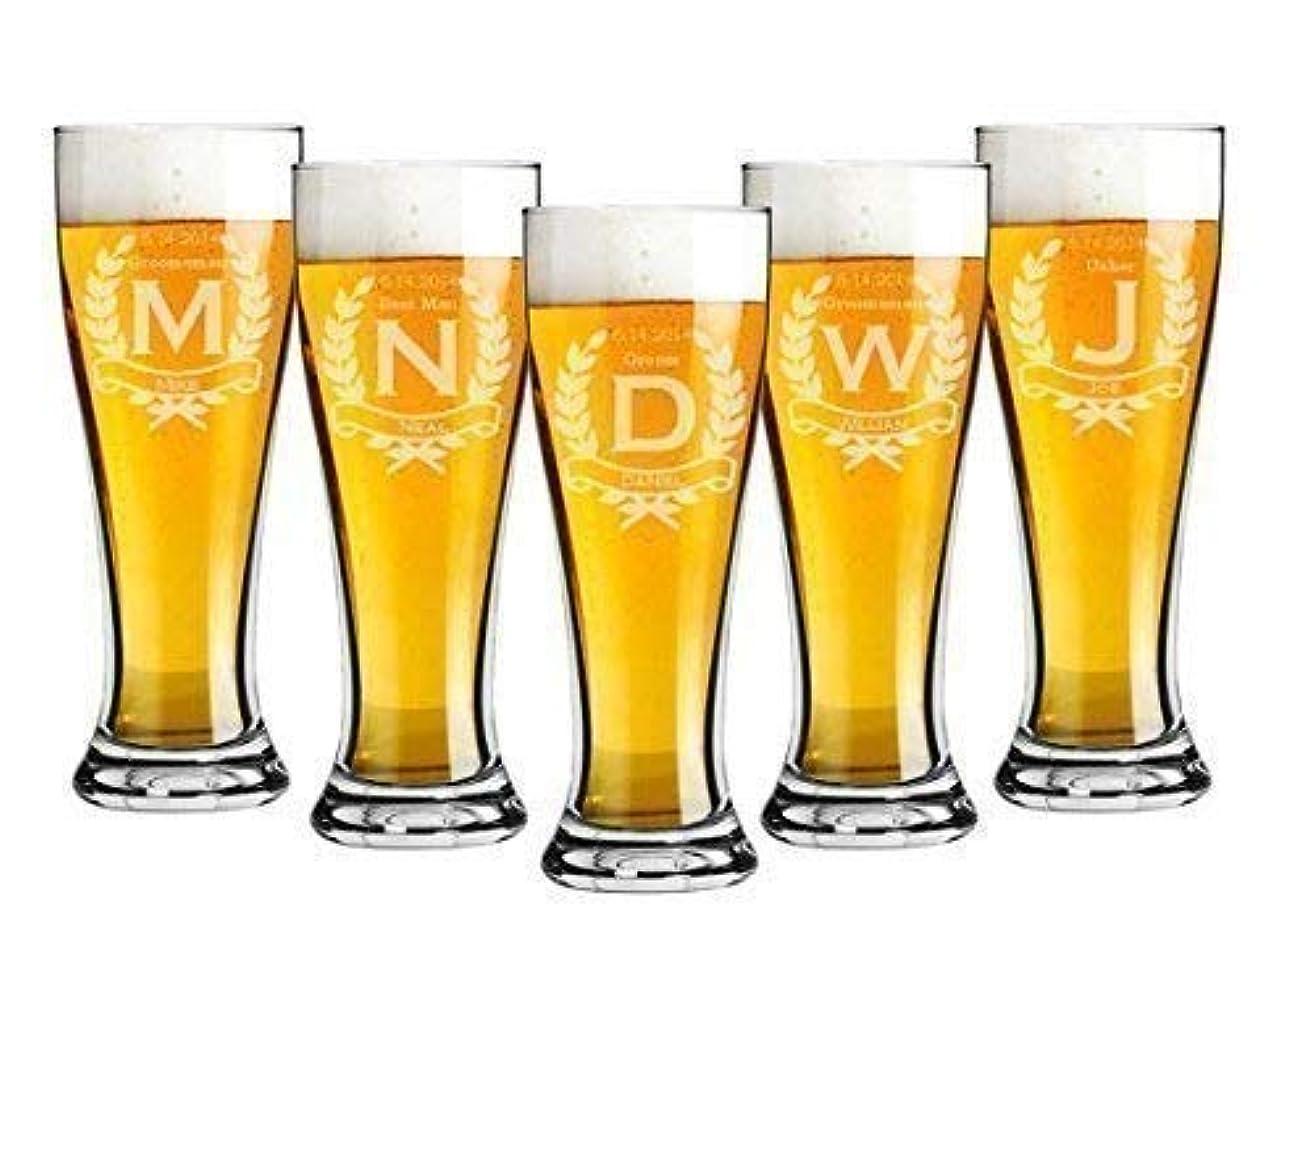 Groomsmen - Pilsner Beer Glass - 16 oz Pint - Set of 2 to 12 - Custom Engraved - Wreath Design - Bride and Groom, Bridesmaid, Bridal Party, Wedding Gift